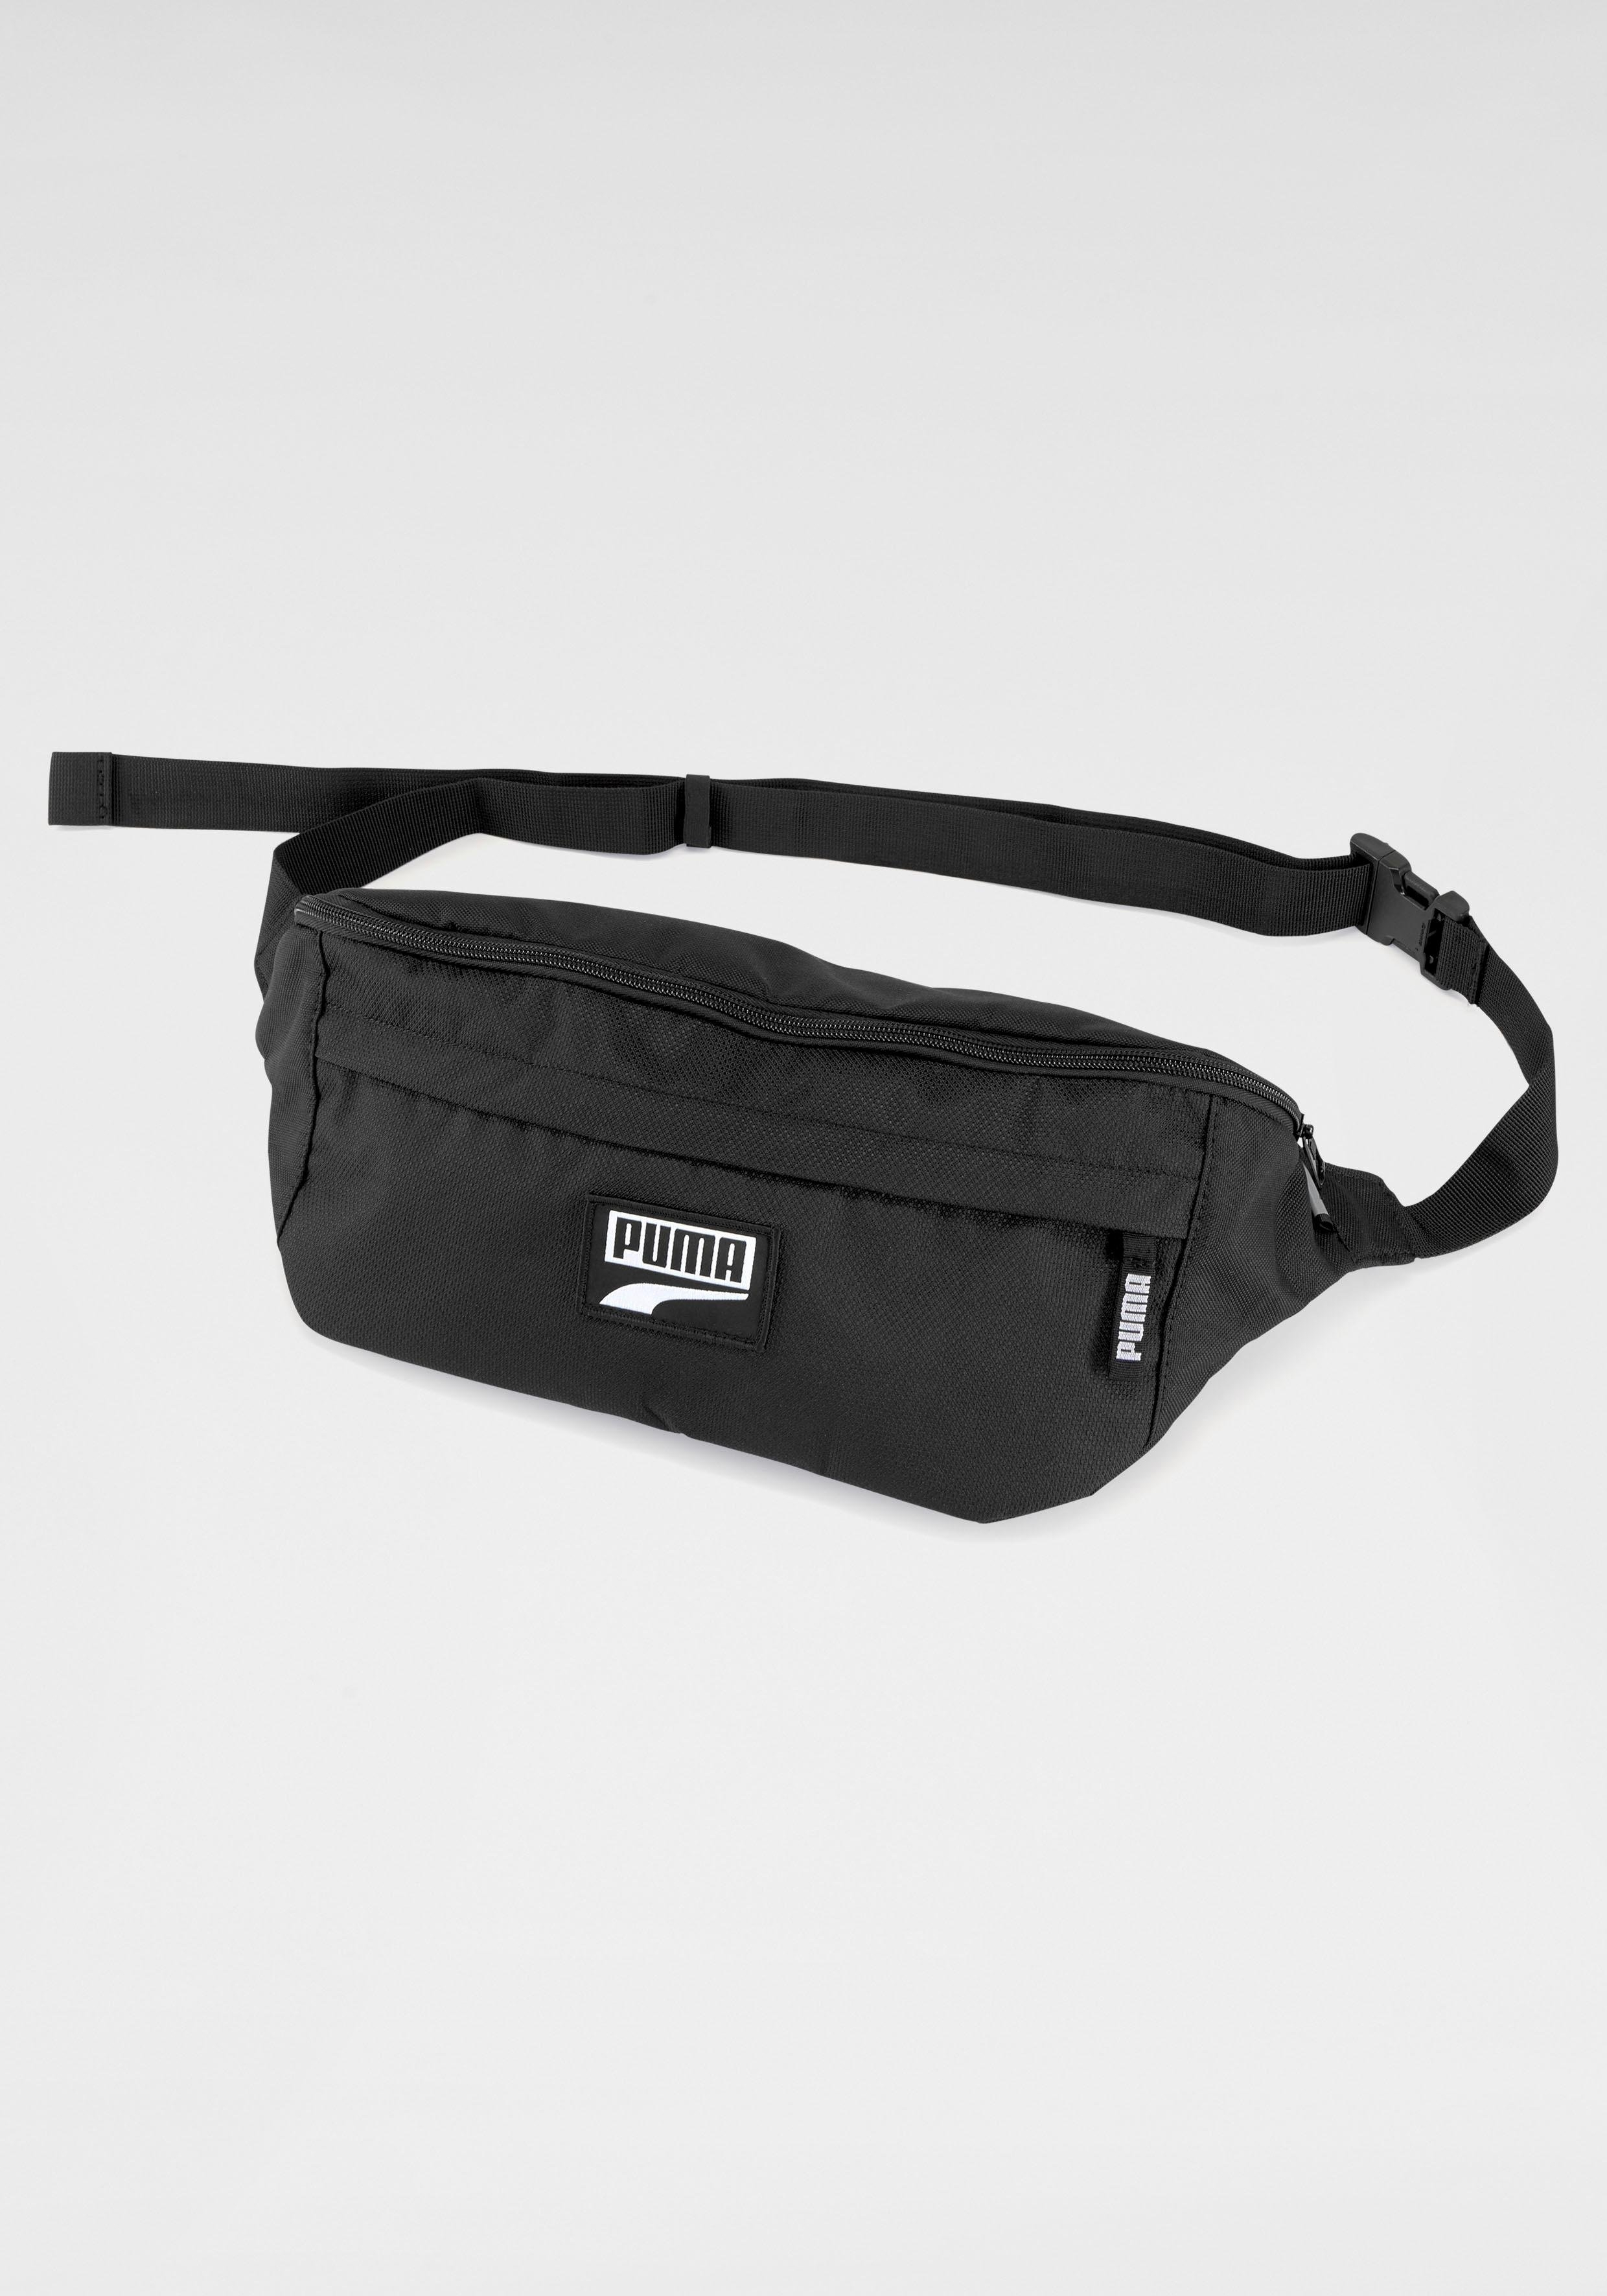 PUMA heuptasje »PUMA Deck Waist Bag XL« bij OTTO online kopen